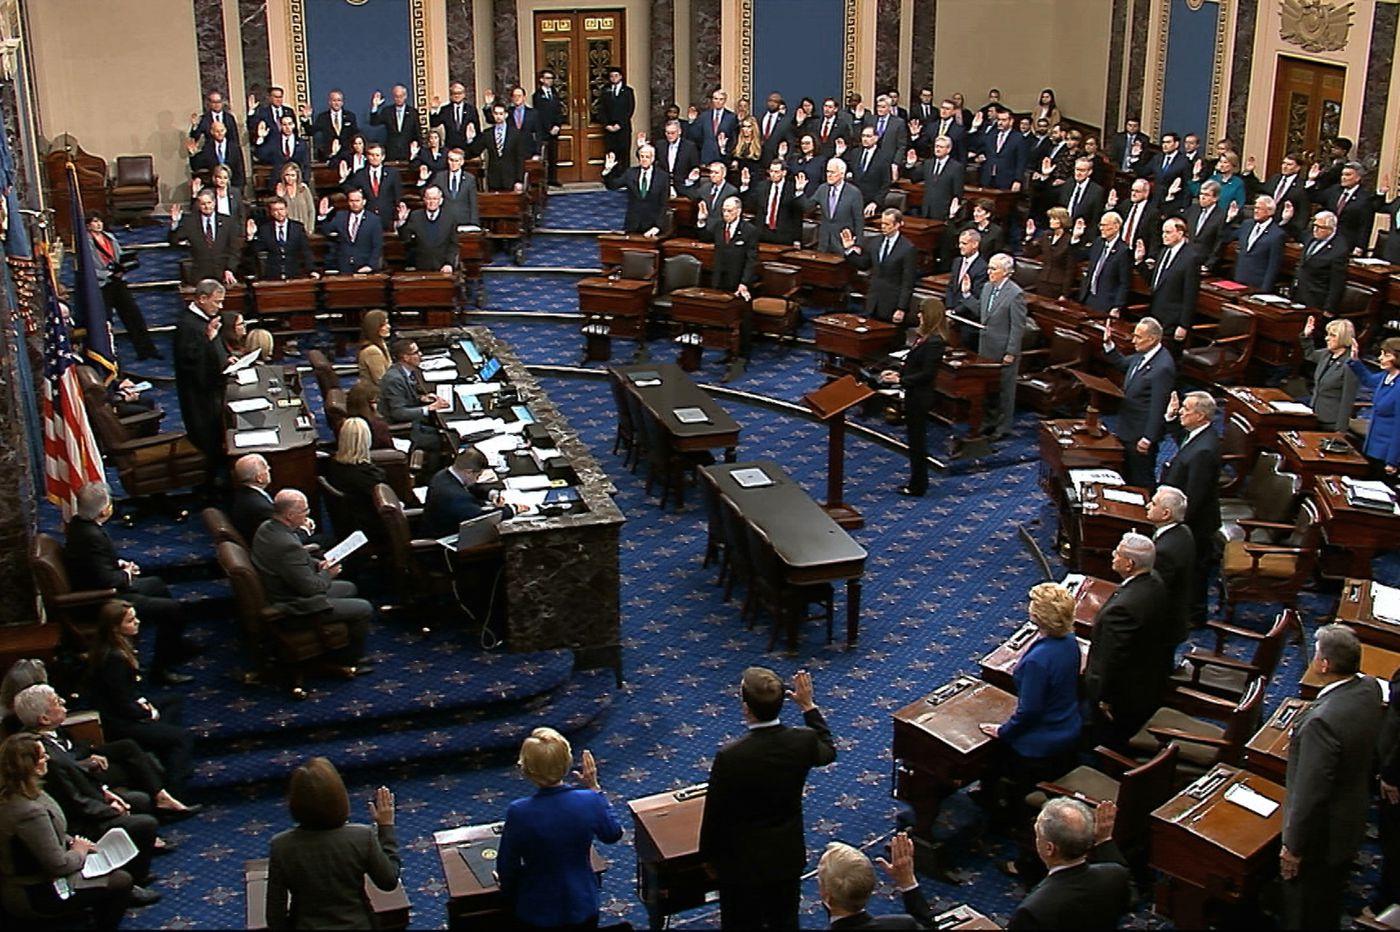 Trump impeachment trial begins, senators vowing 'impartial justice'